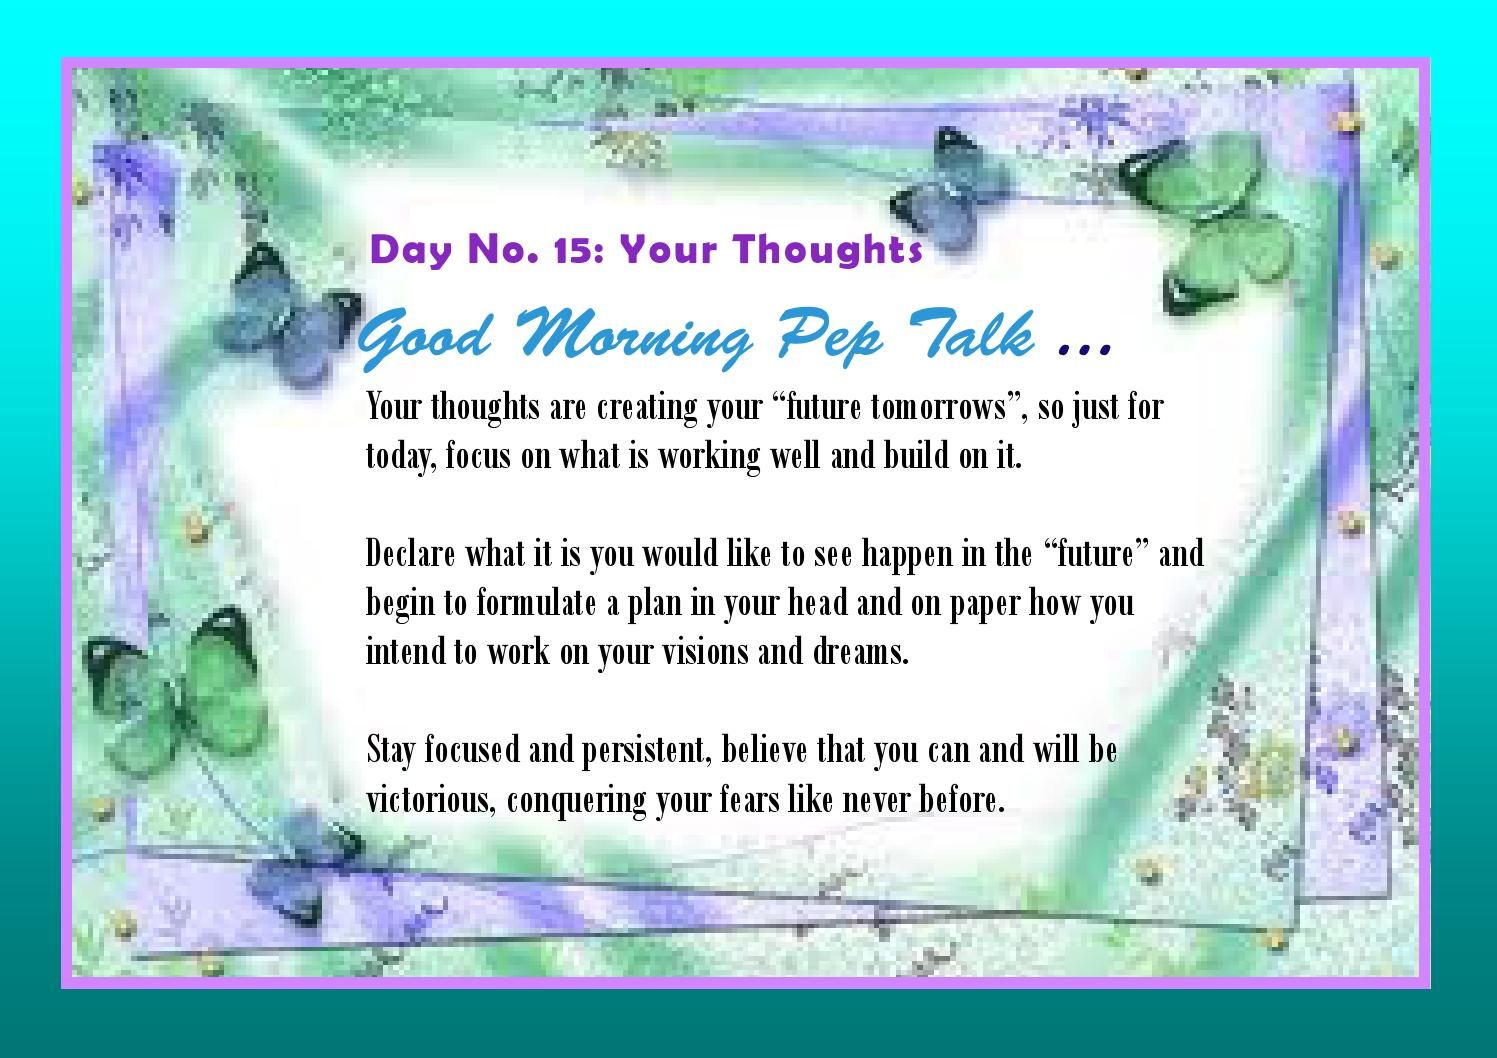 Good morning daily pep talks ebook 2014 daily pep talks ebook 2014 fandeluxe PDF